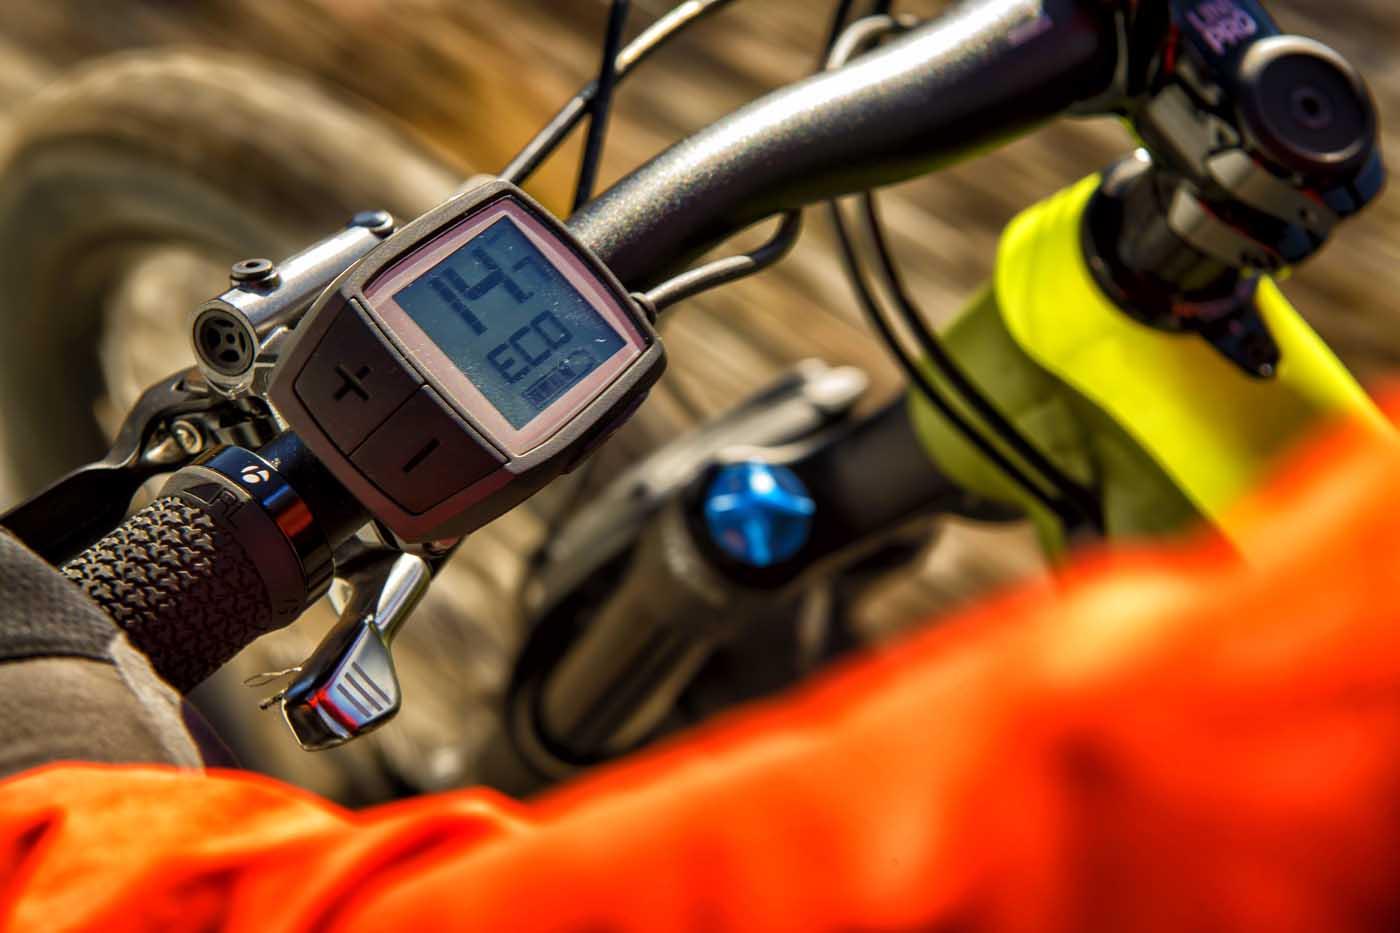 E]volution: e-Bike motor 'power' modes 101 - [R]evolution MTB